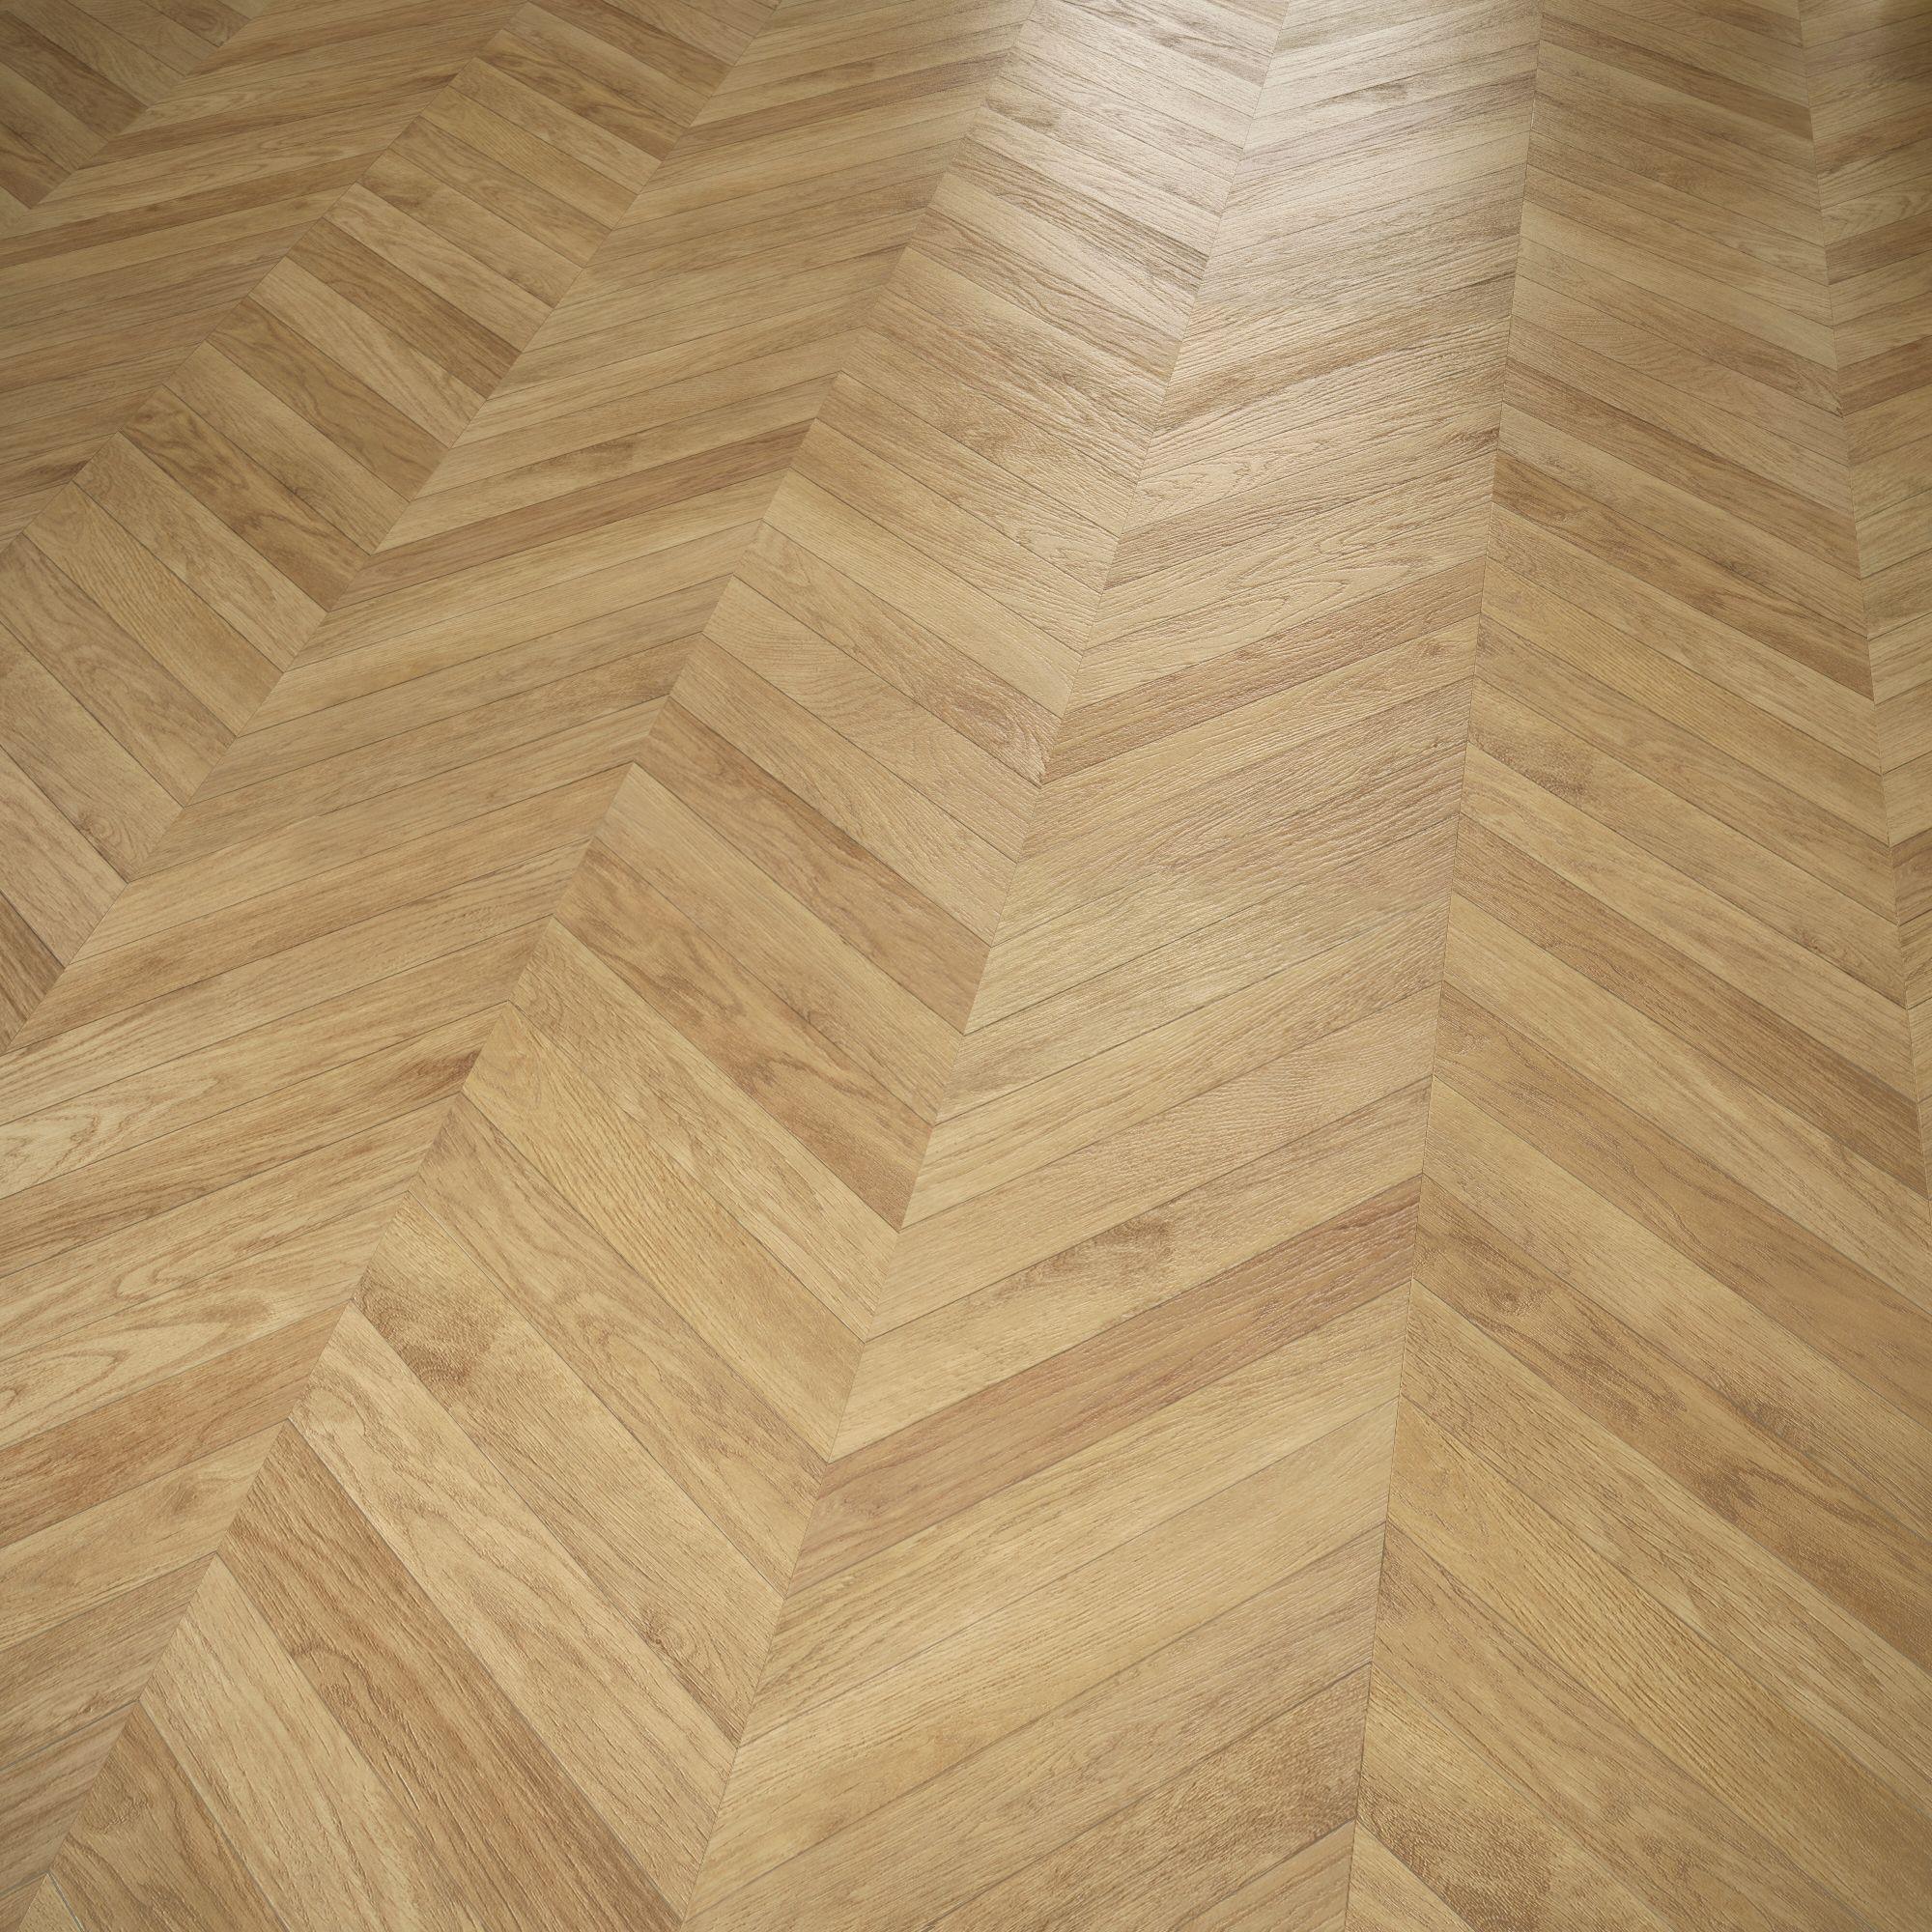 kitchen laminate flooring Colours Alessano Parquet Herringbone Oak Effect Laminate Flooring 1 39 m Departments DIY at B